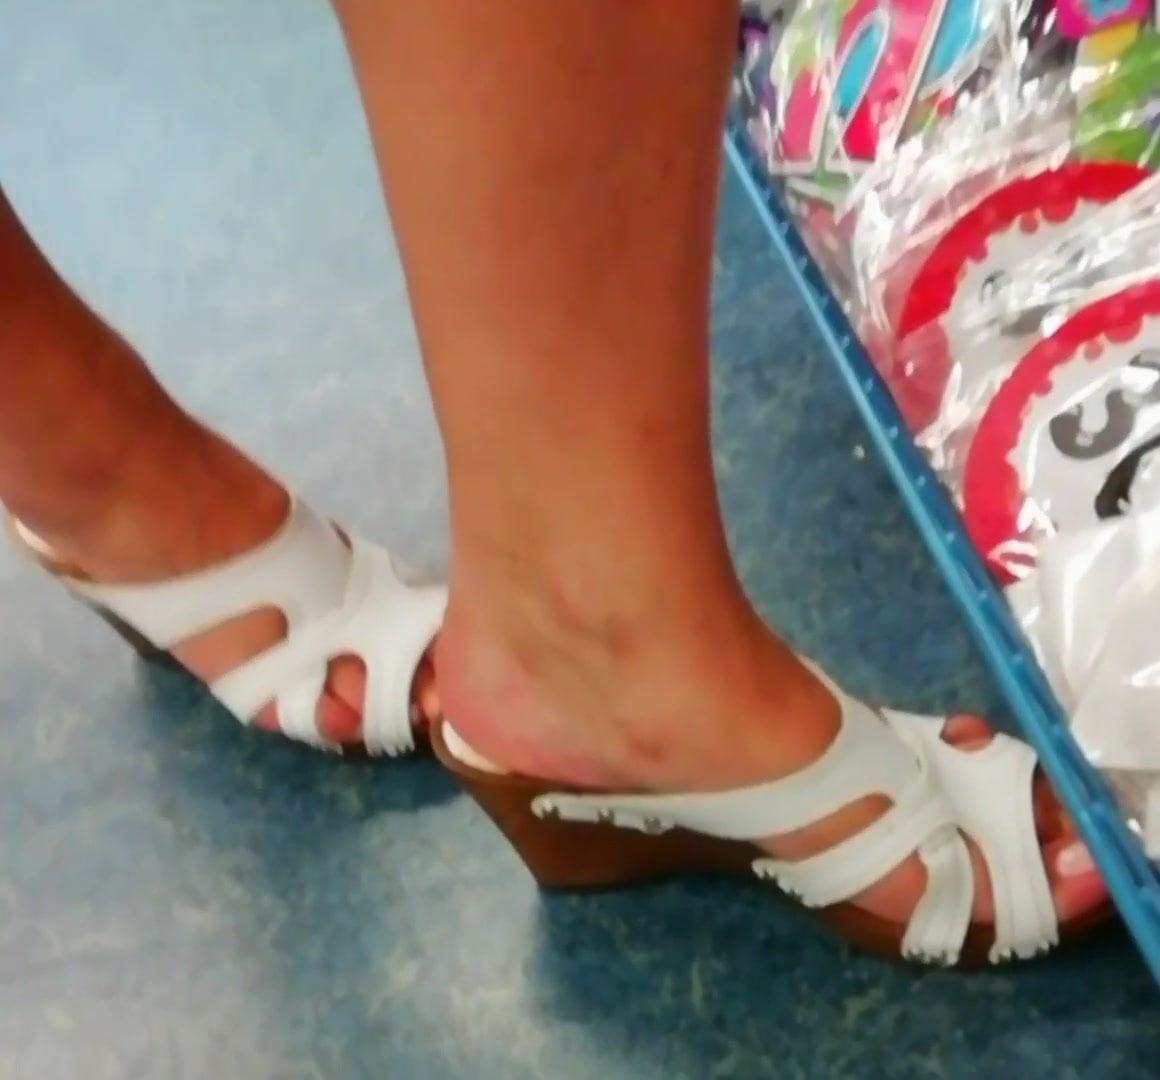 Candid horny milf feet and footjob toes faceshot